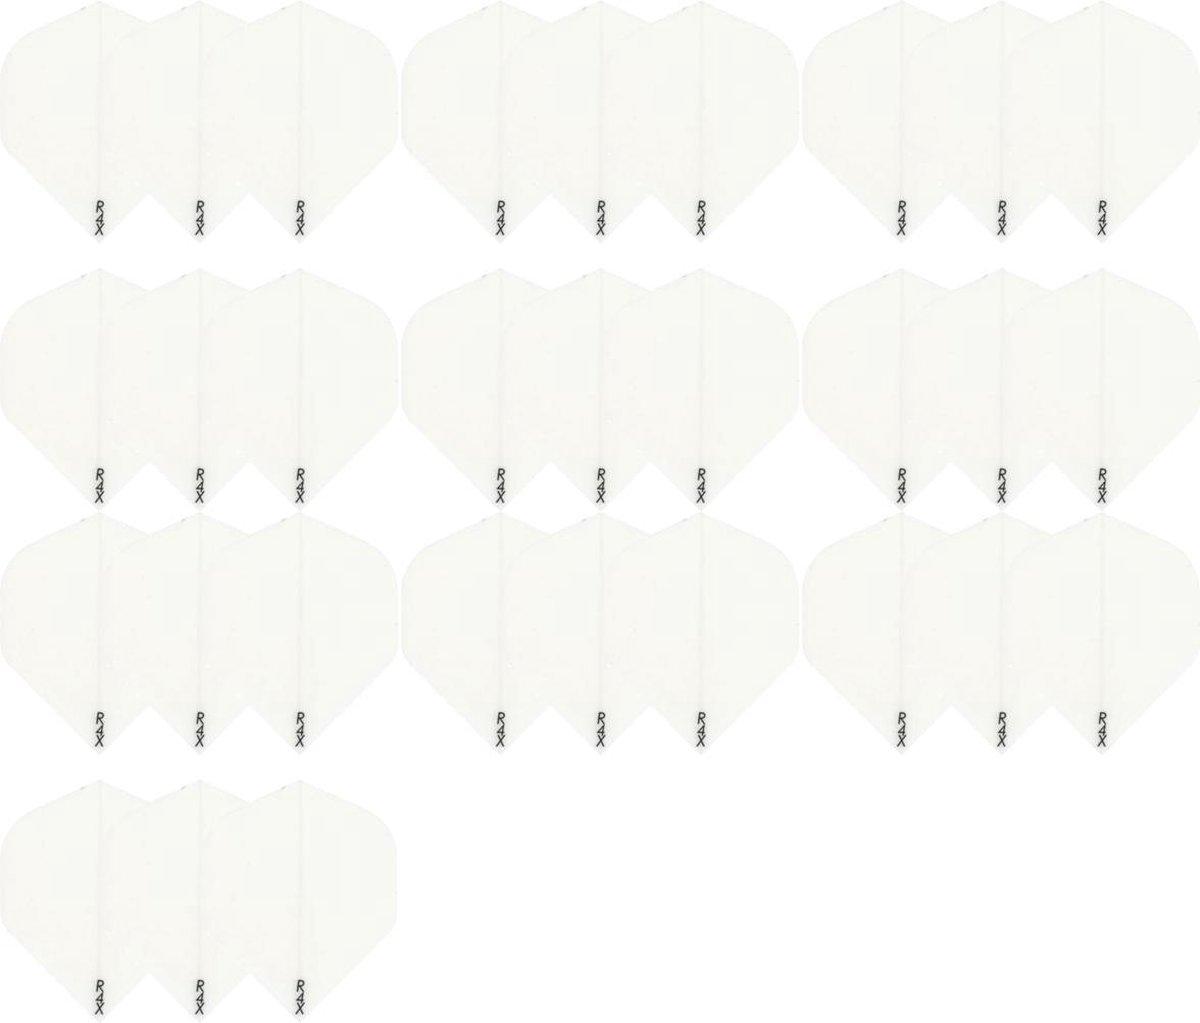 Dragon darts - 10 Sets (30 stuks) zeer stevige R4x - dart flights - Wit - darts flights